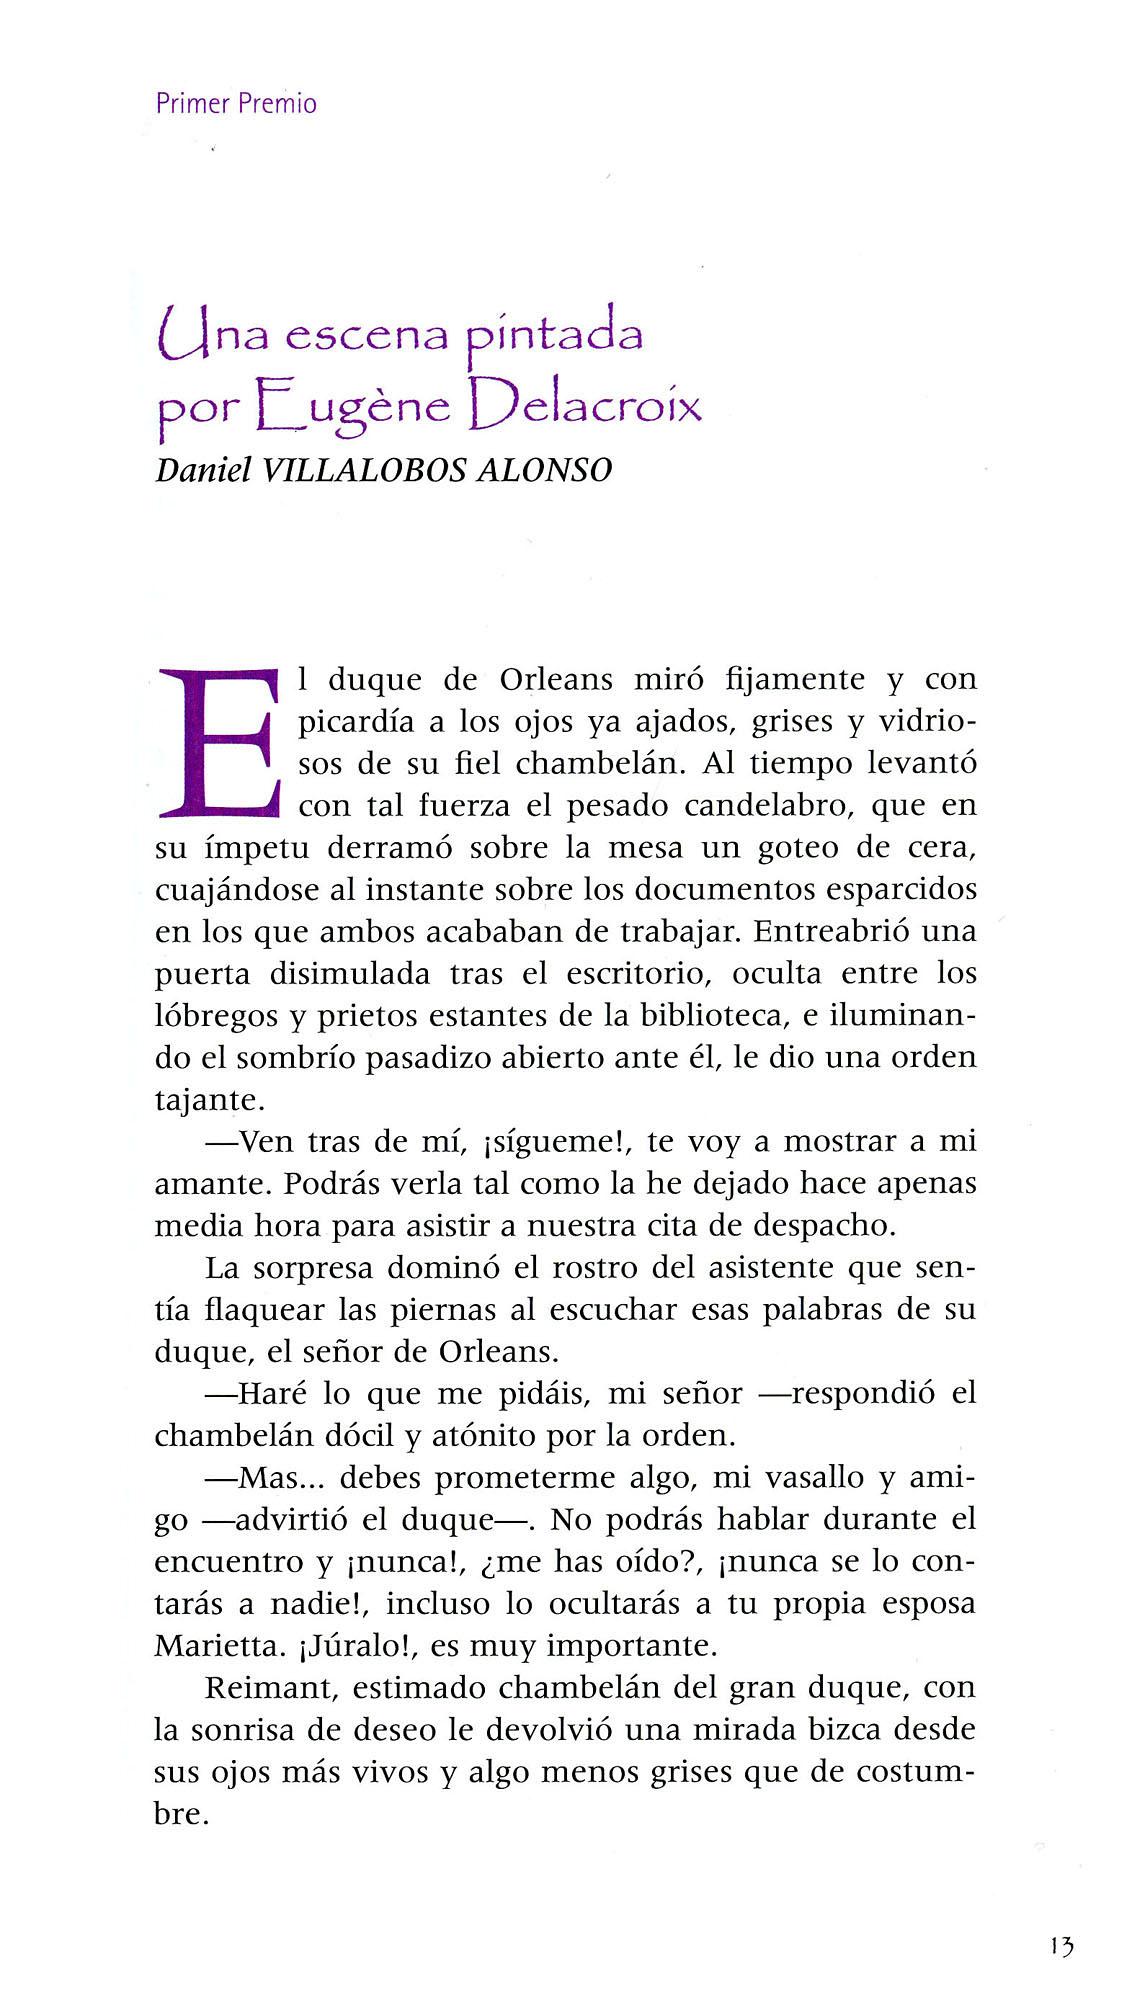 danielvillalobos-calderonsamaniego-story-storyerotic-spanishliterature-6